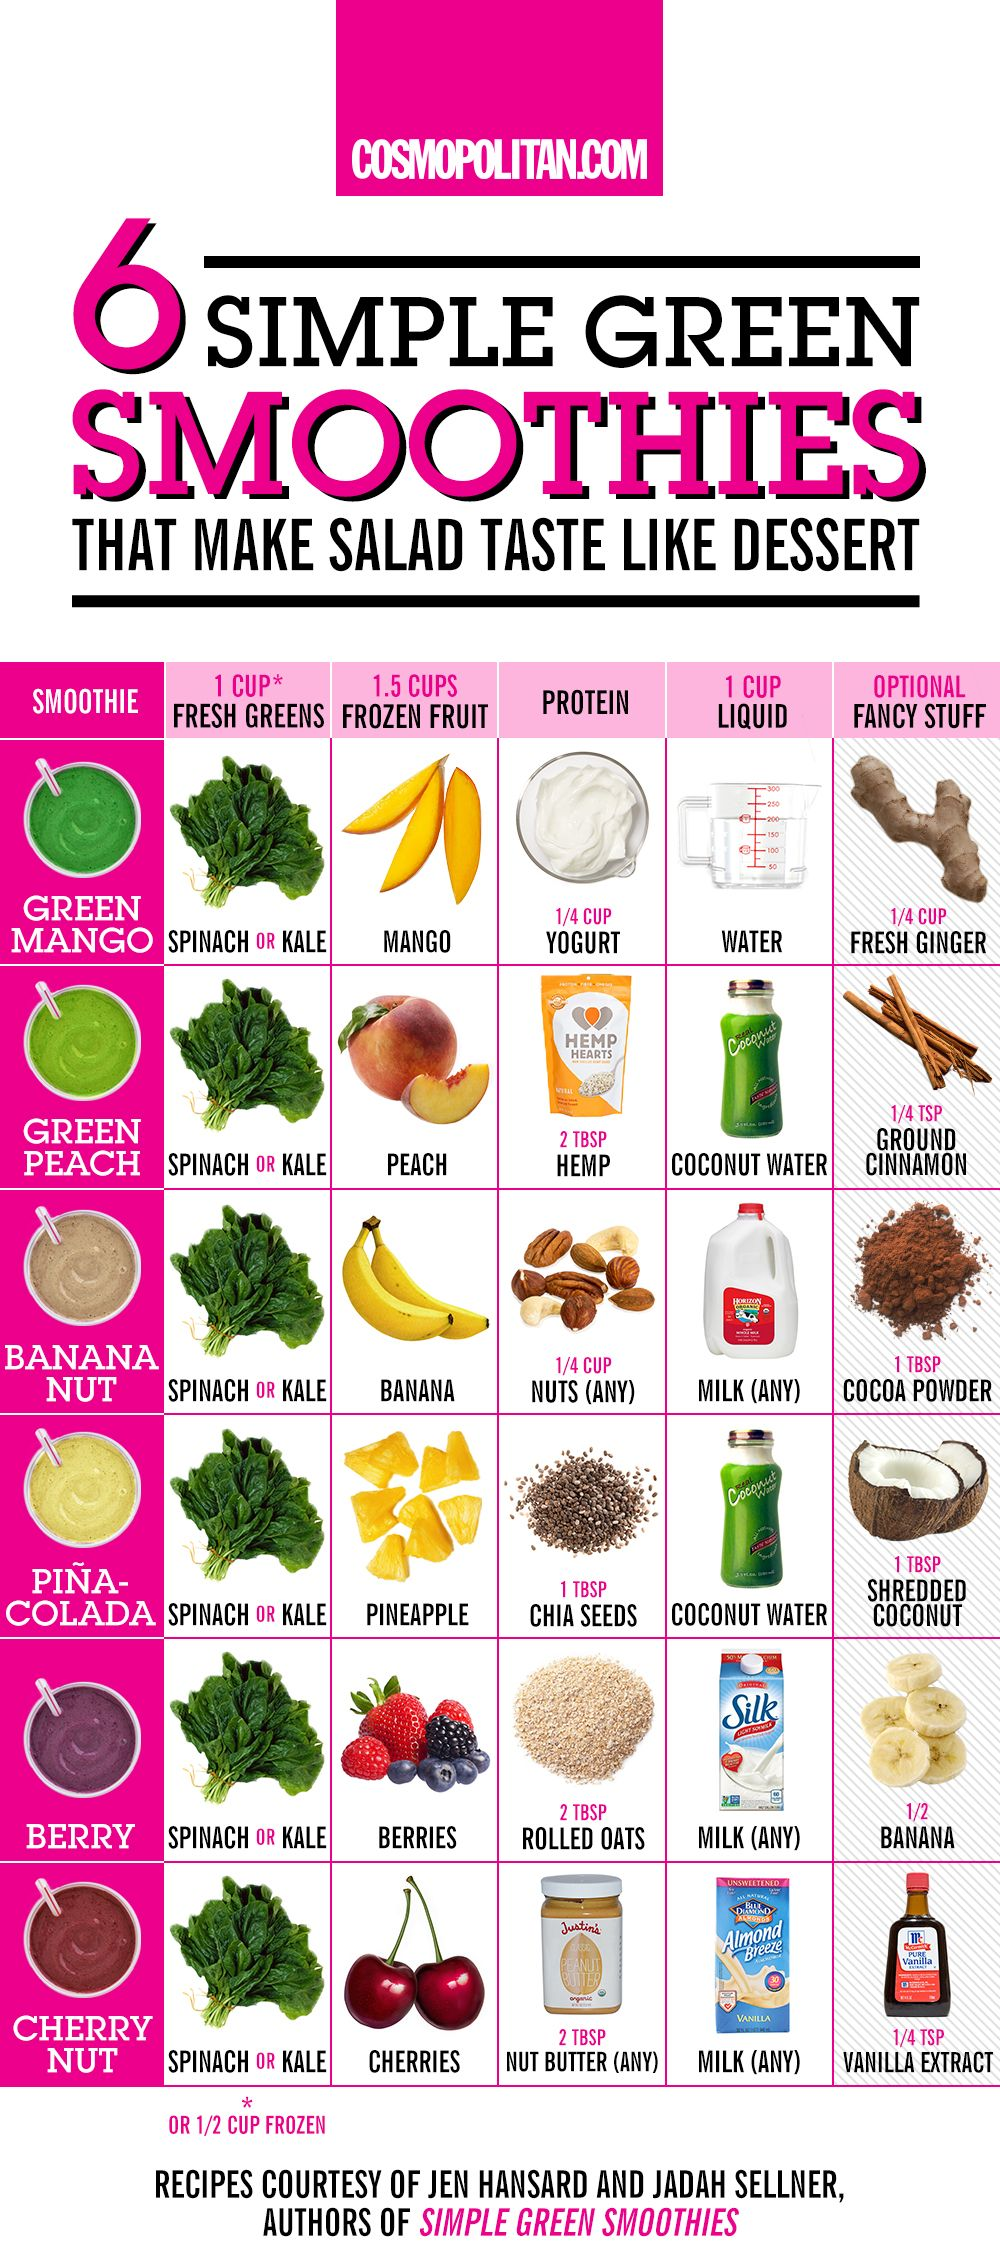 healthy eating tips and food hacks 47 food hacks to help you eat healthier [ 1000 x 2267 Pixel ]